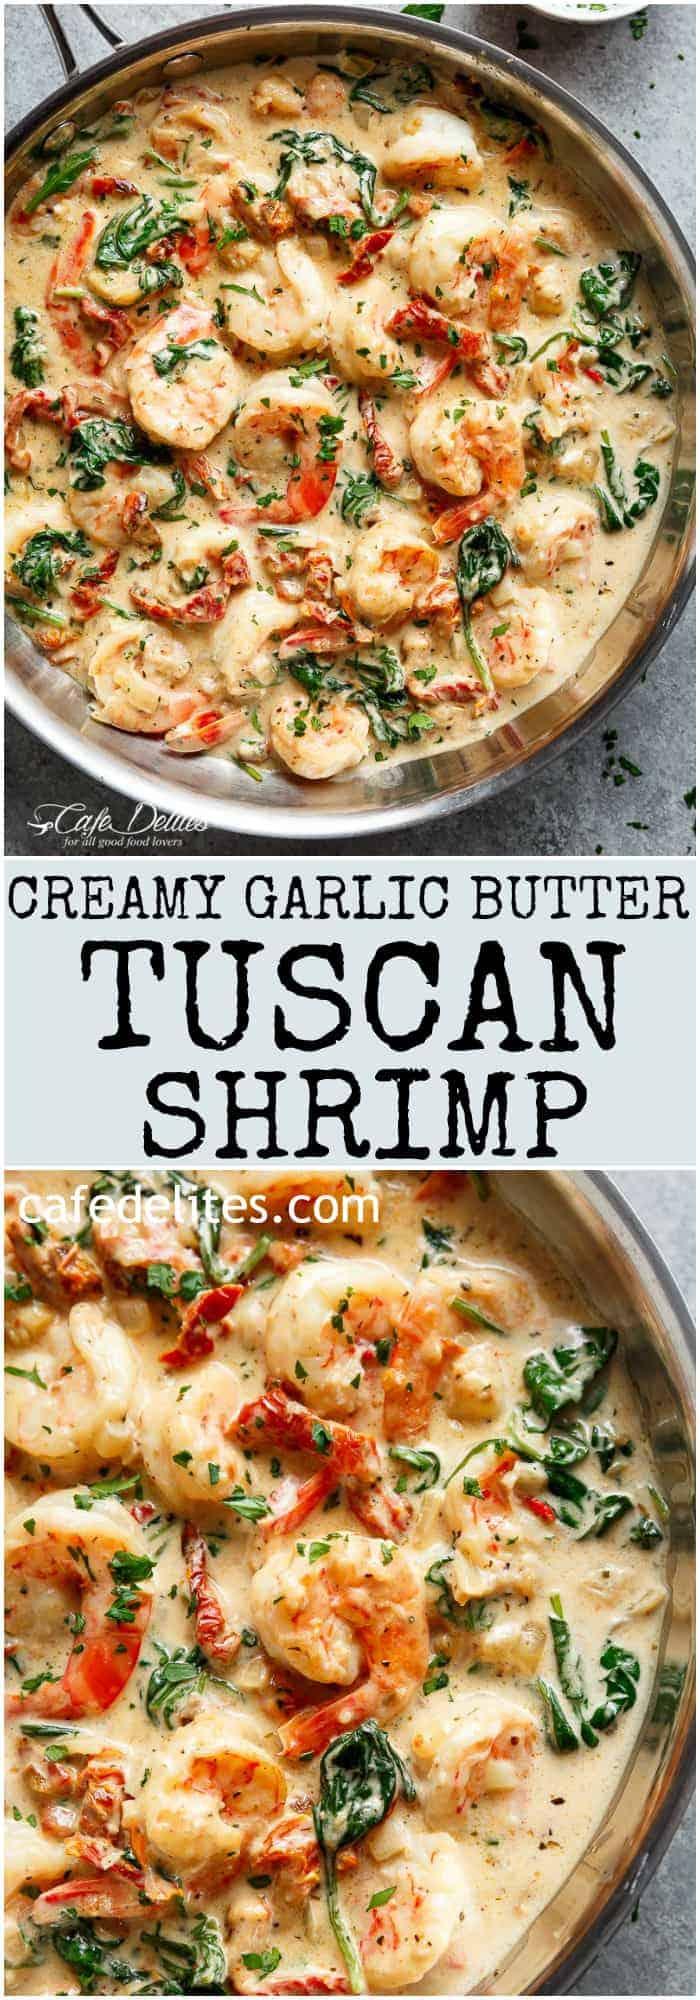 Creamy Garlic Butter Tuscan Shrimp Video Cafe Delites